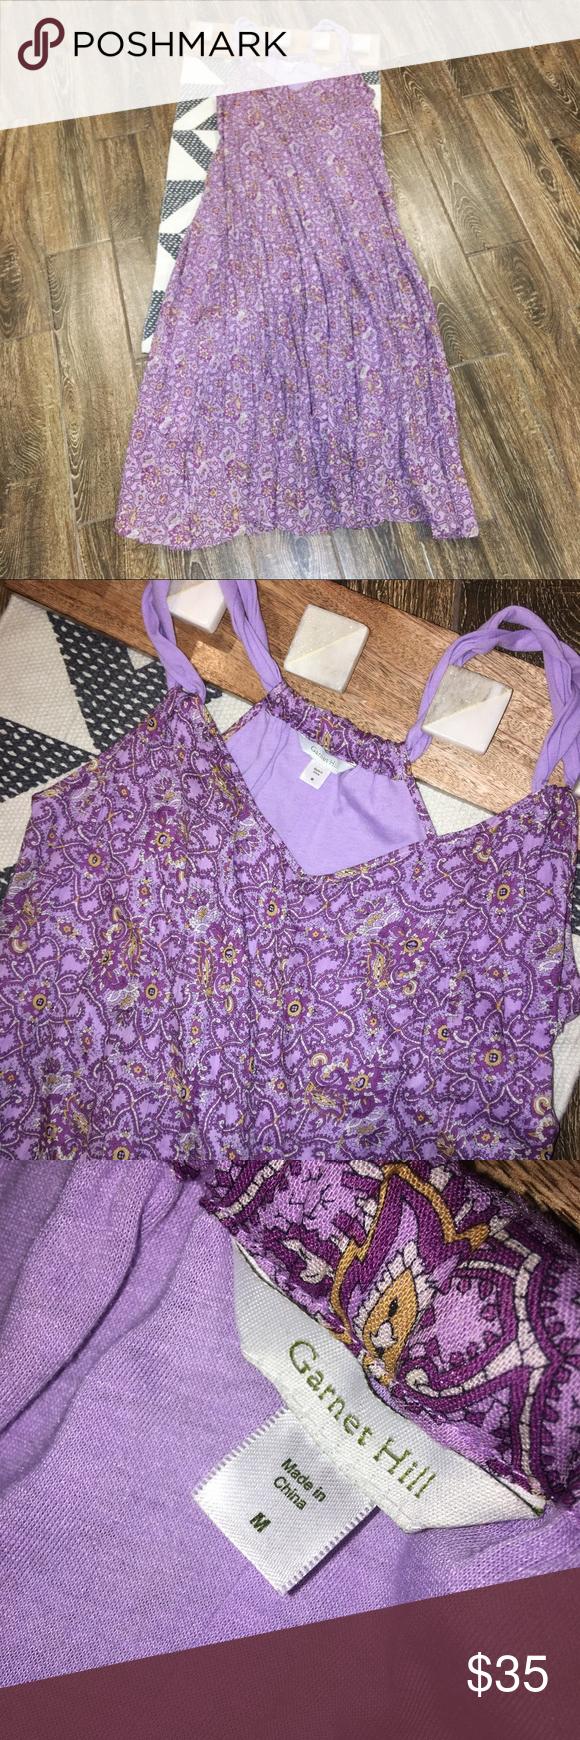 389a05f8e6 Garnet Hill Purple Paisley Gauze Maxi Dress Garnet Hill Women's Cotton  Gauze Long Dress. Twisted straps. Size medium. All measurements in photos.